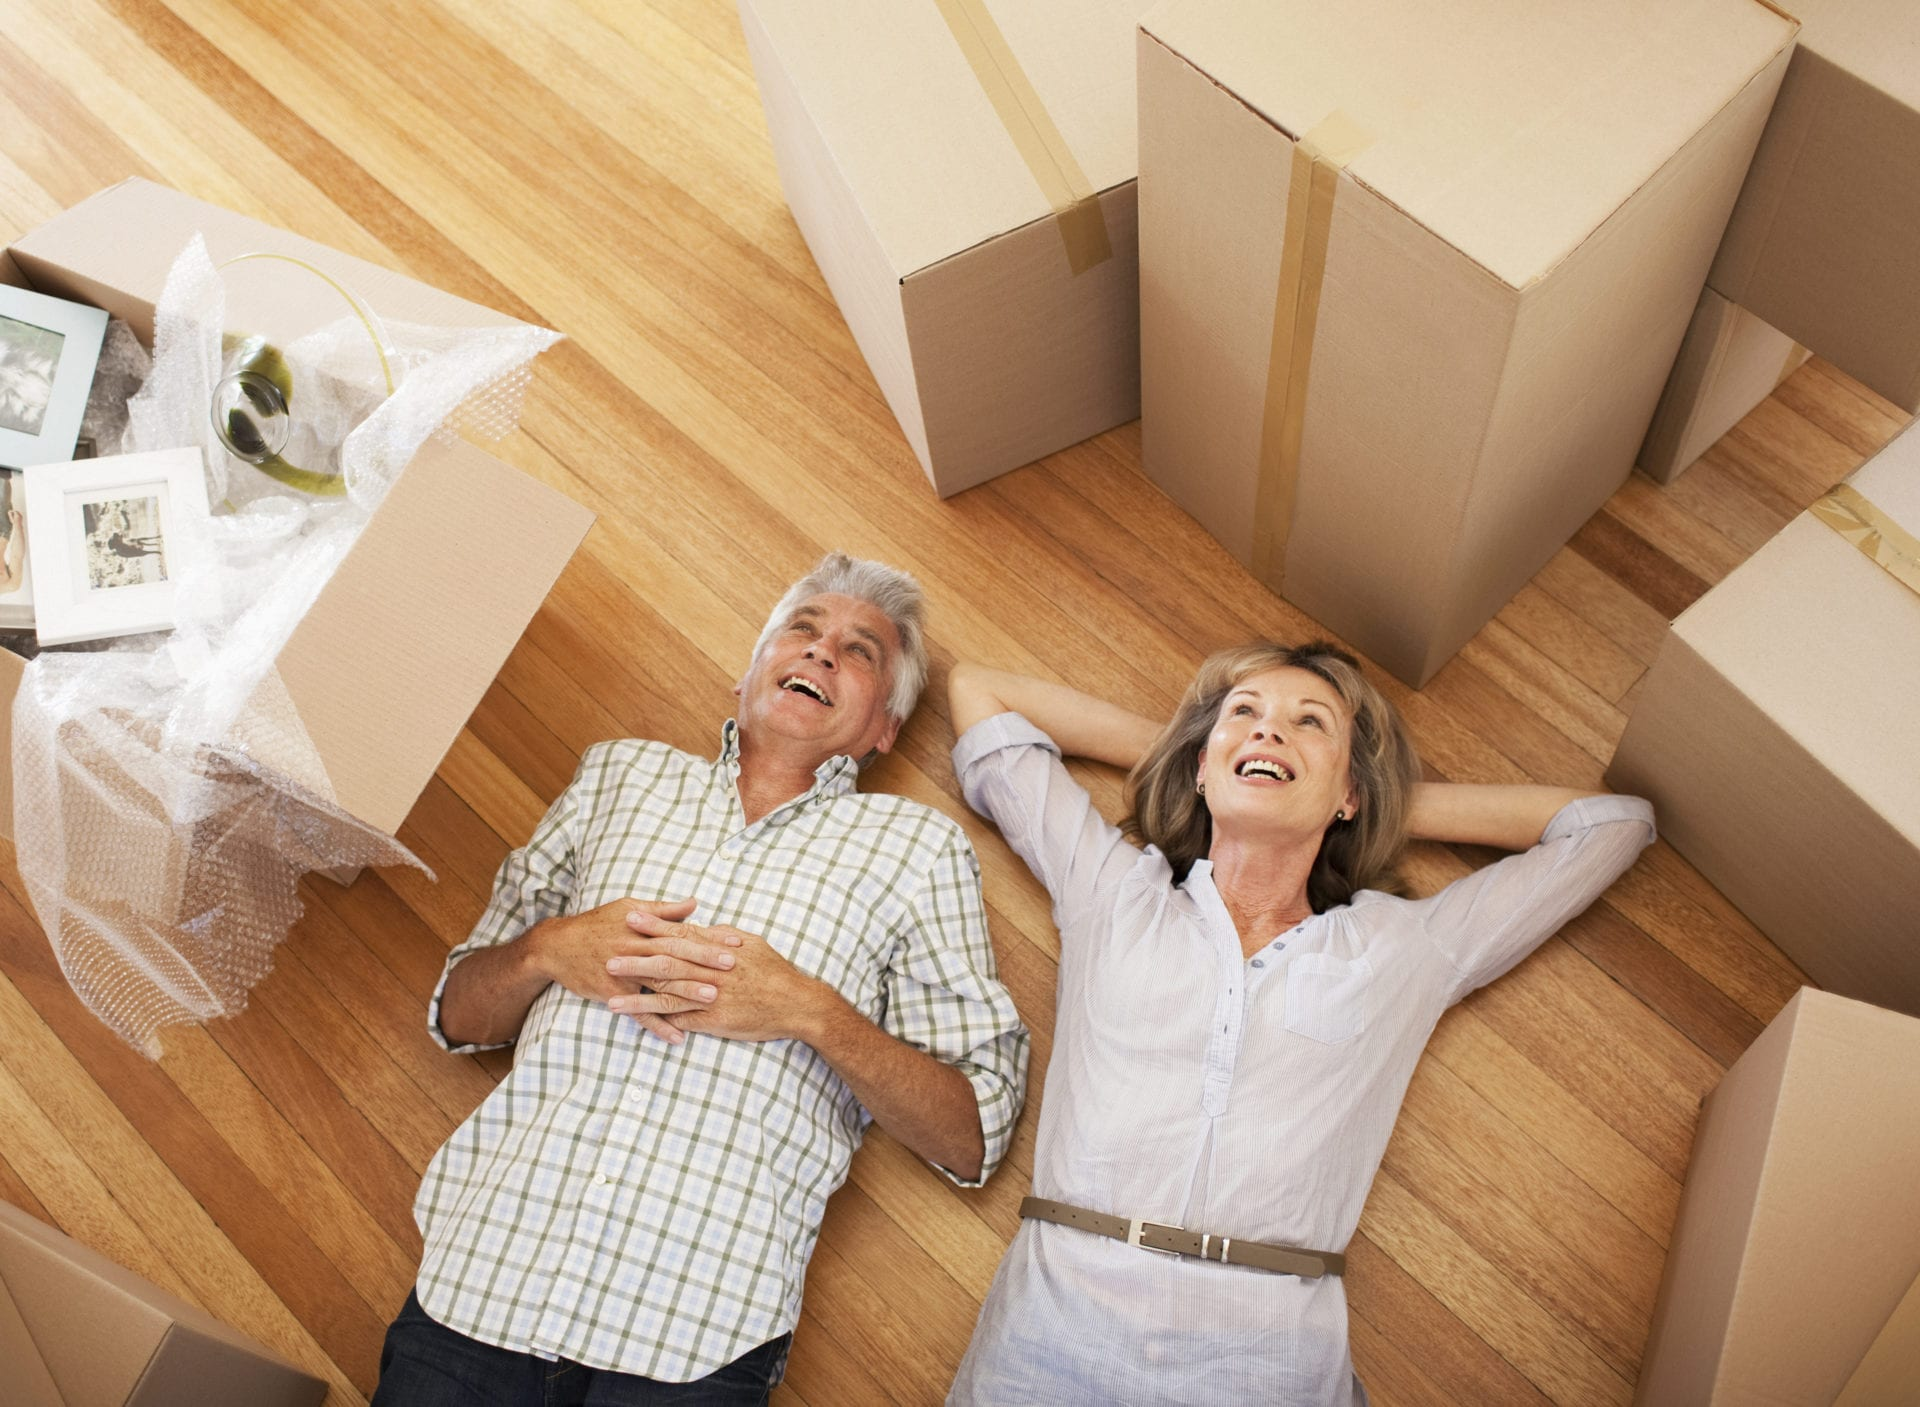 Seniors downsizing